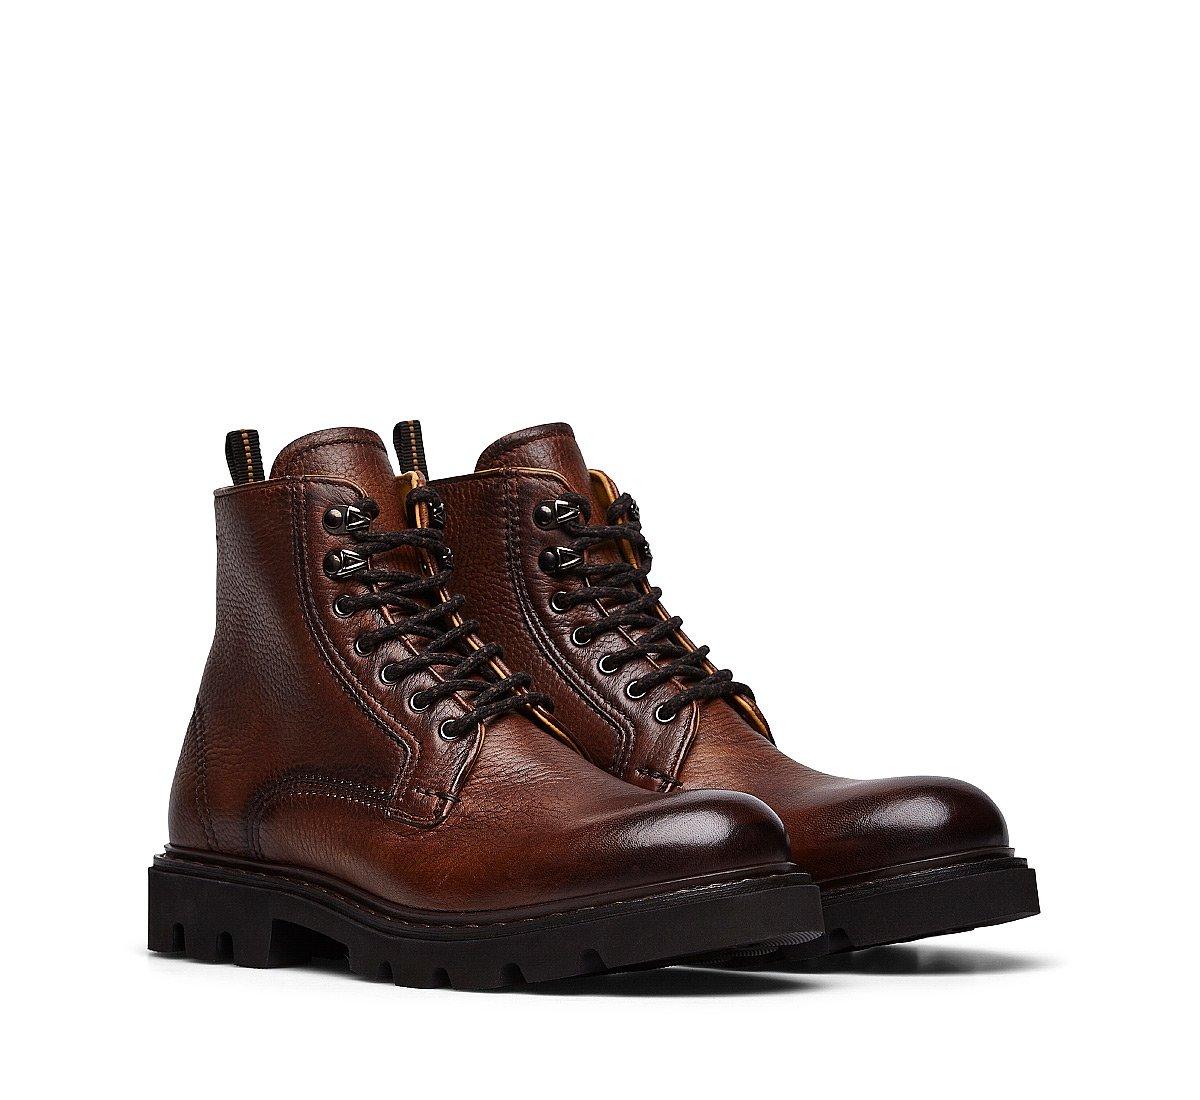 Deerskin ankle boots